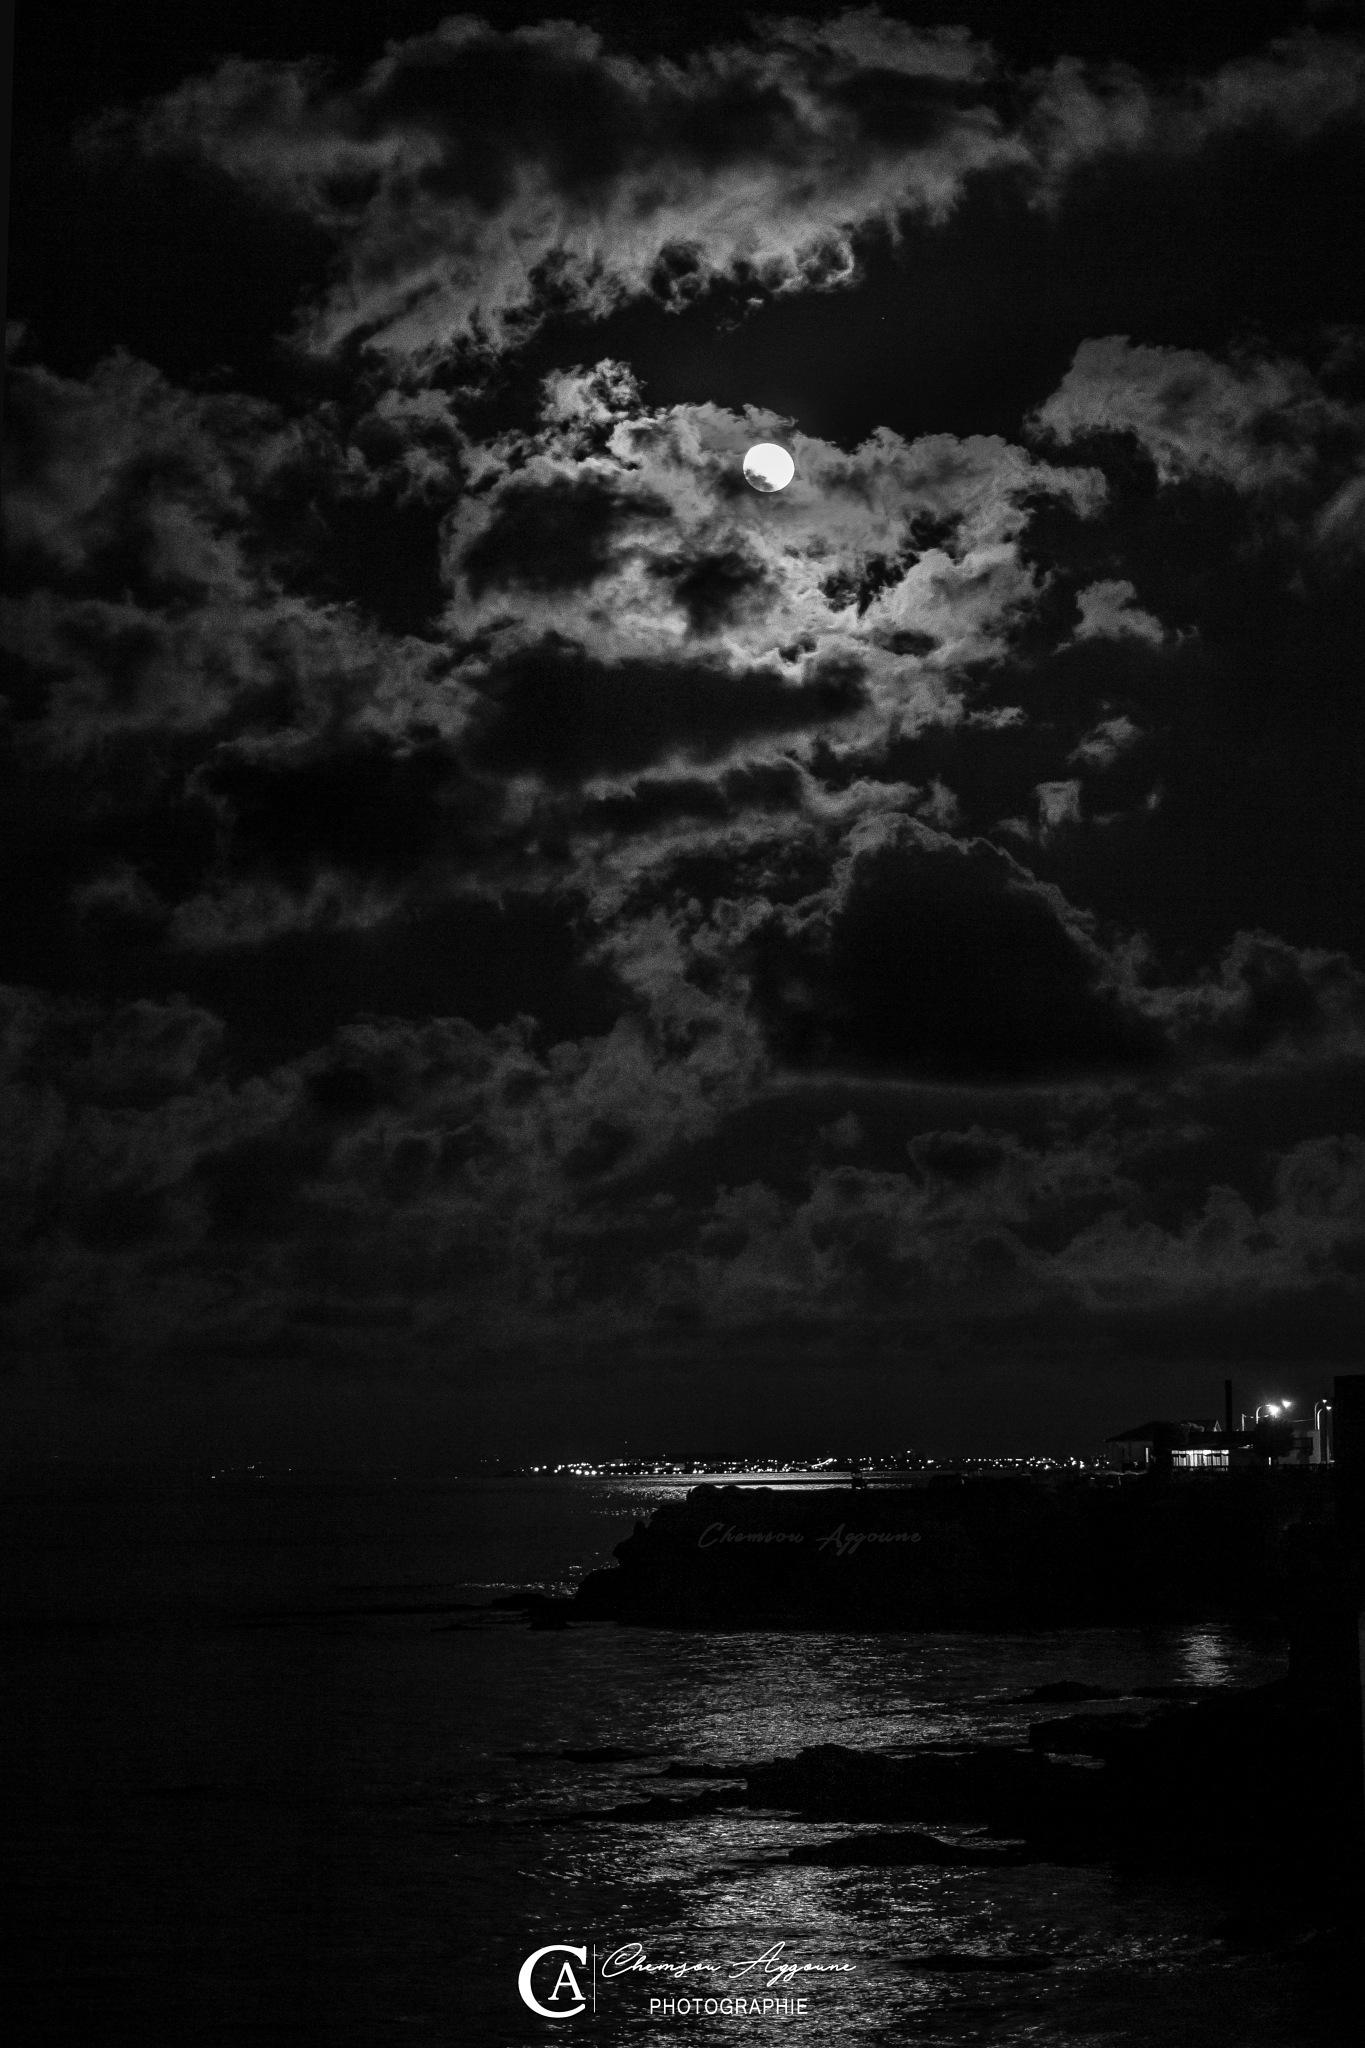 Rais hemido Algiers, moon  by Chemsou Aggoune